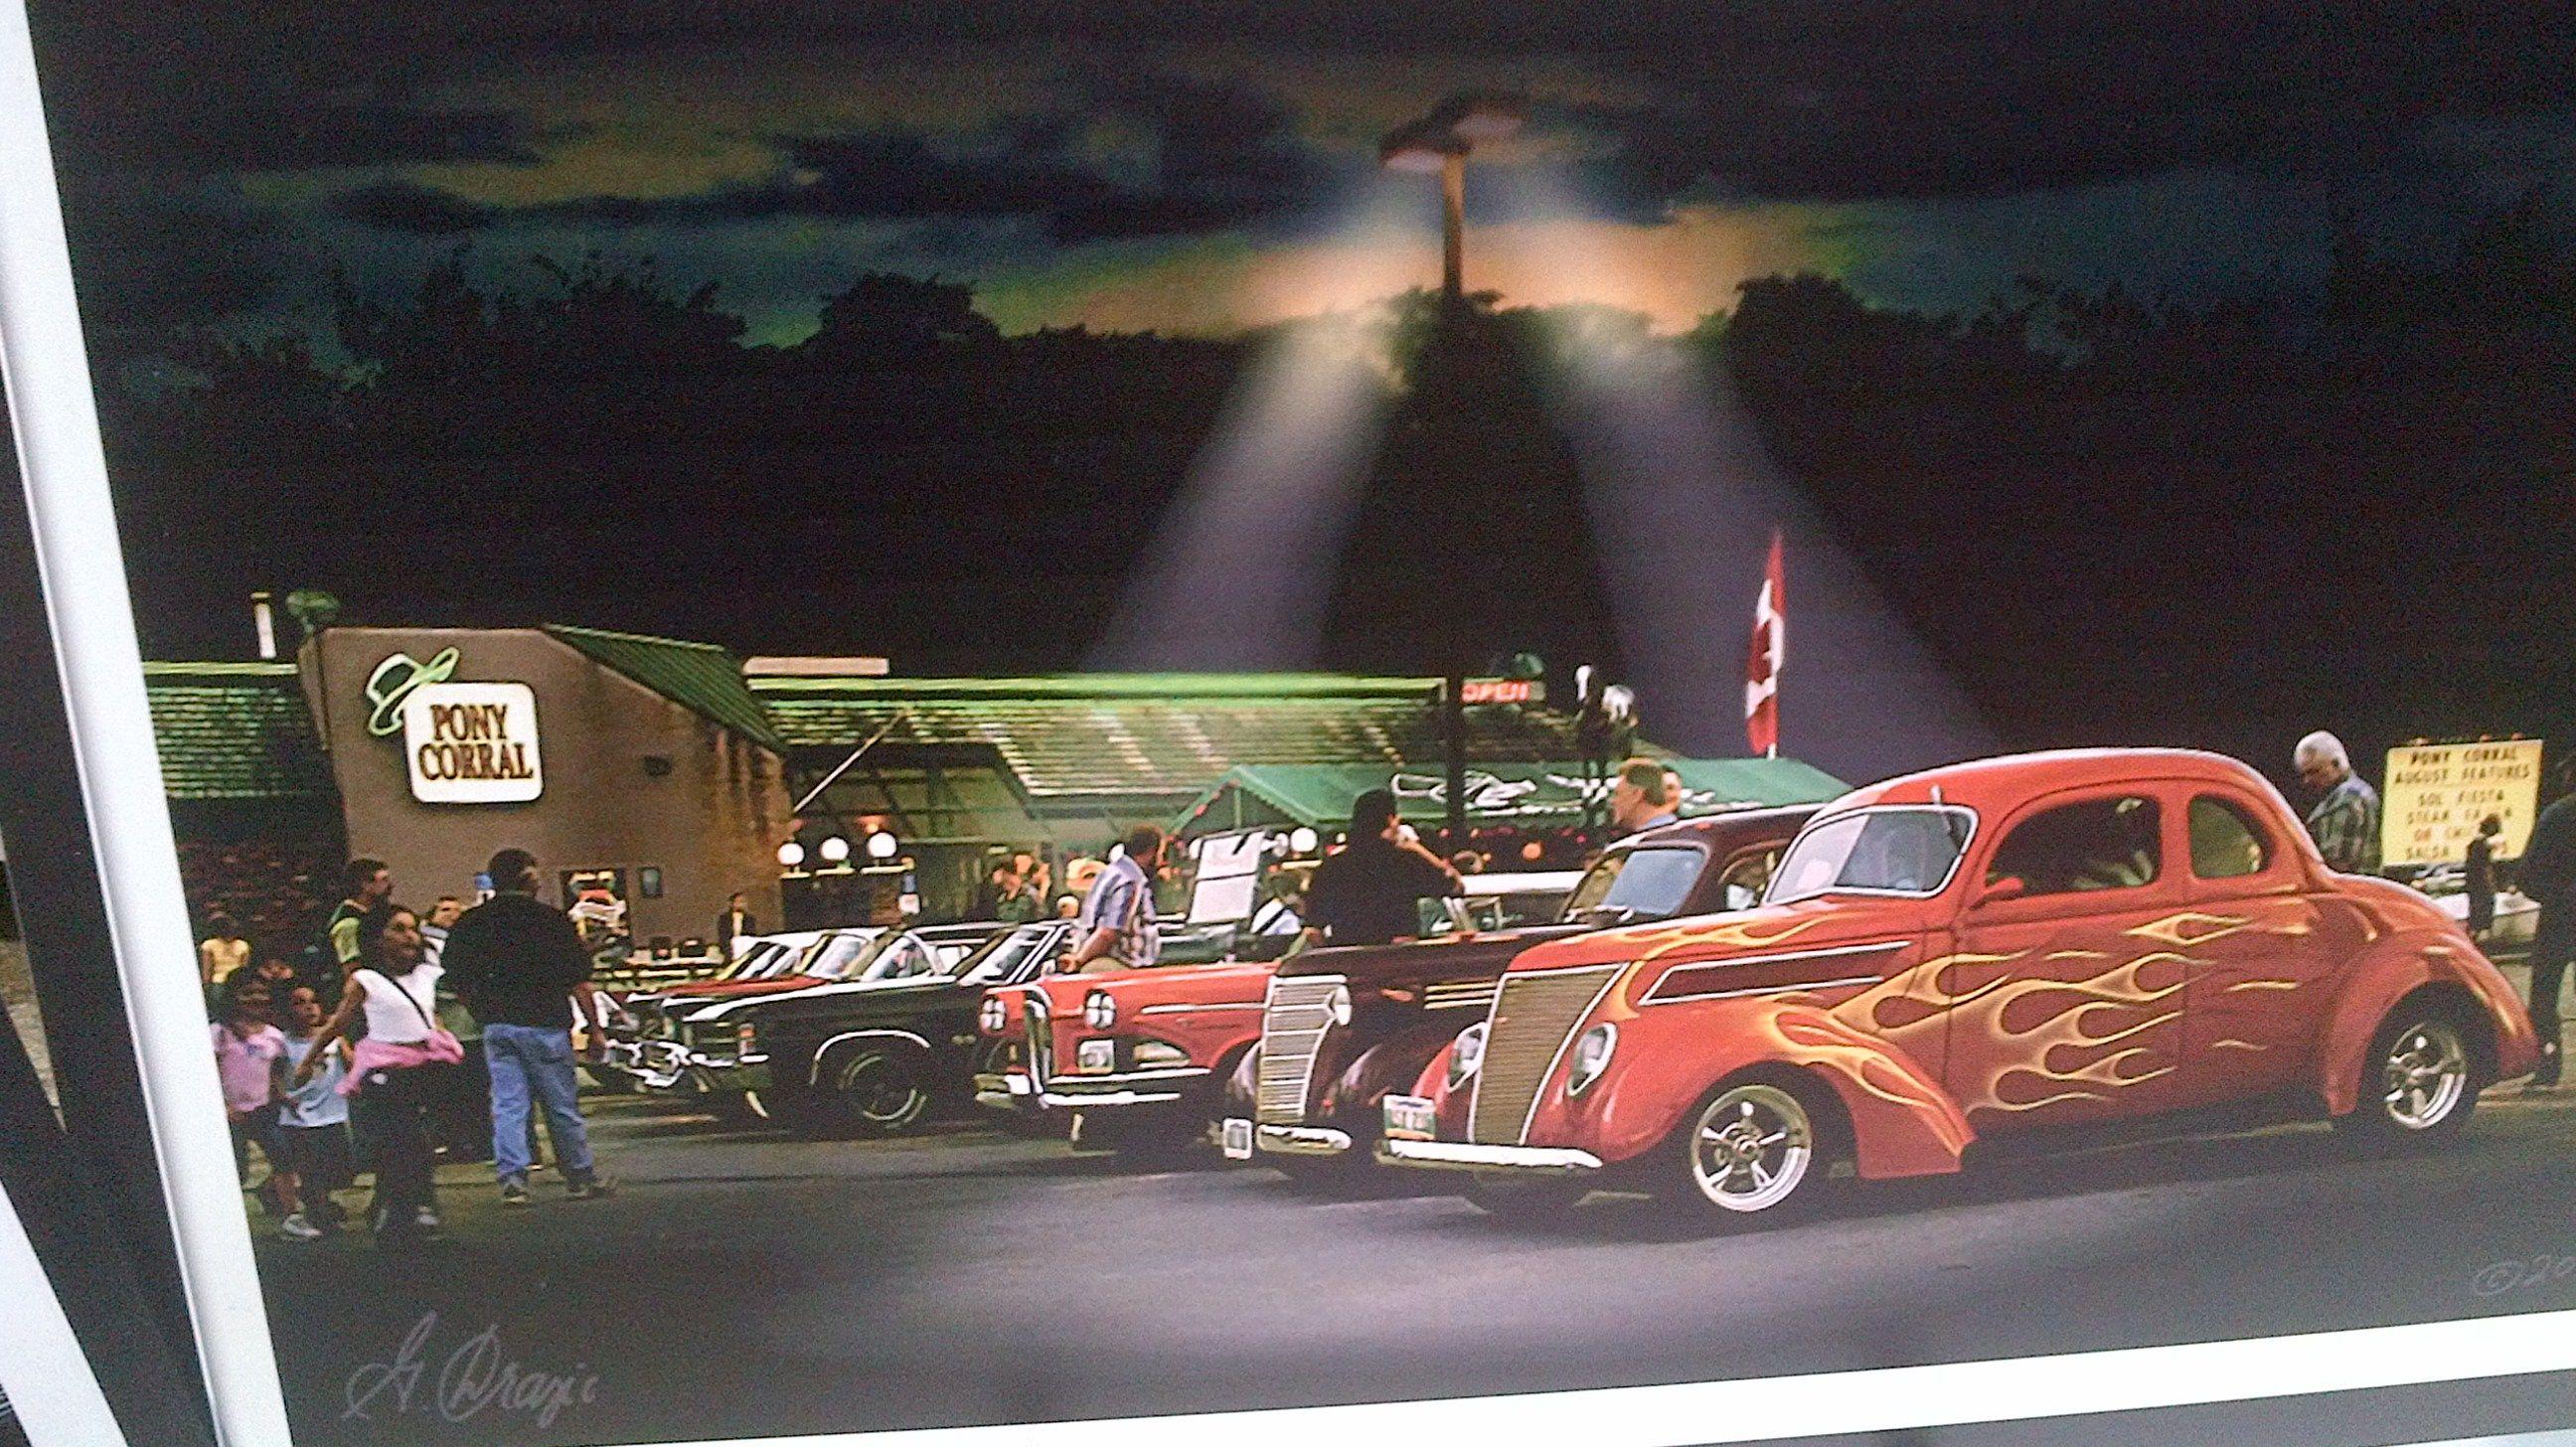 Pony Corral Auto Show Paining (Winnipeg Manitoba Canada) Vintage ...